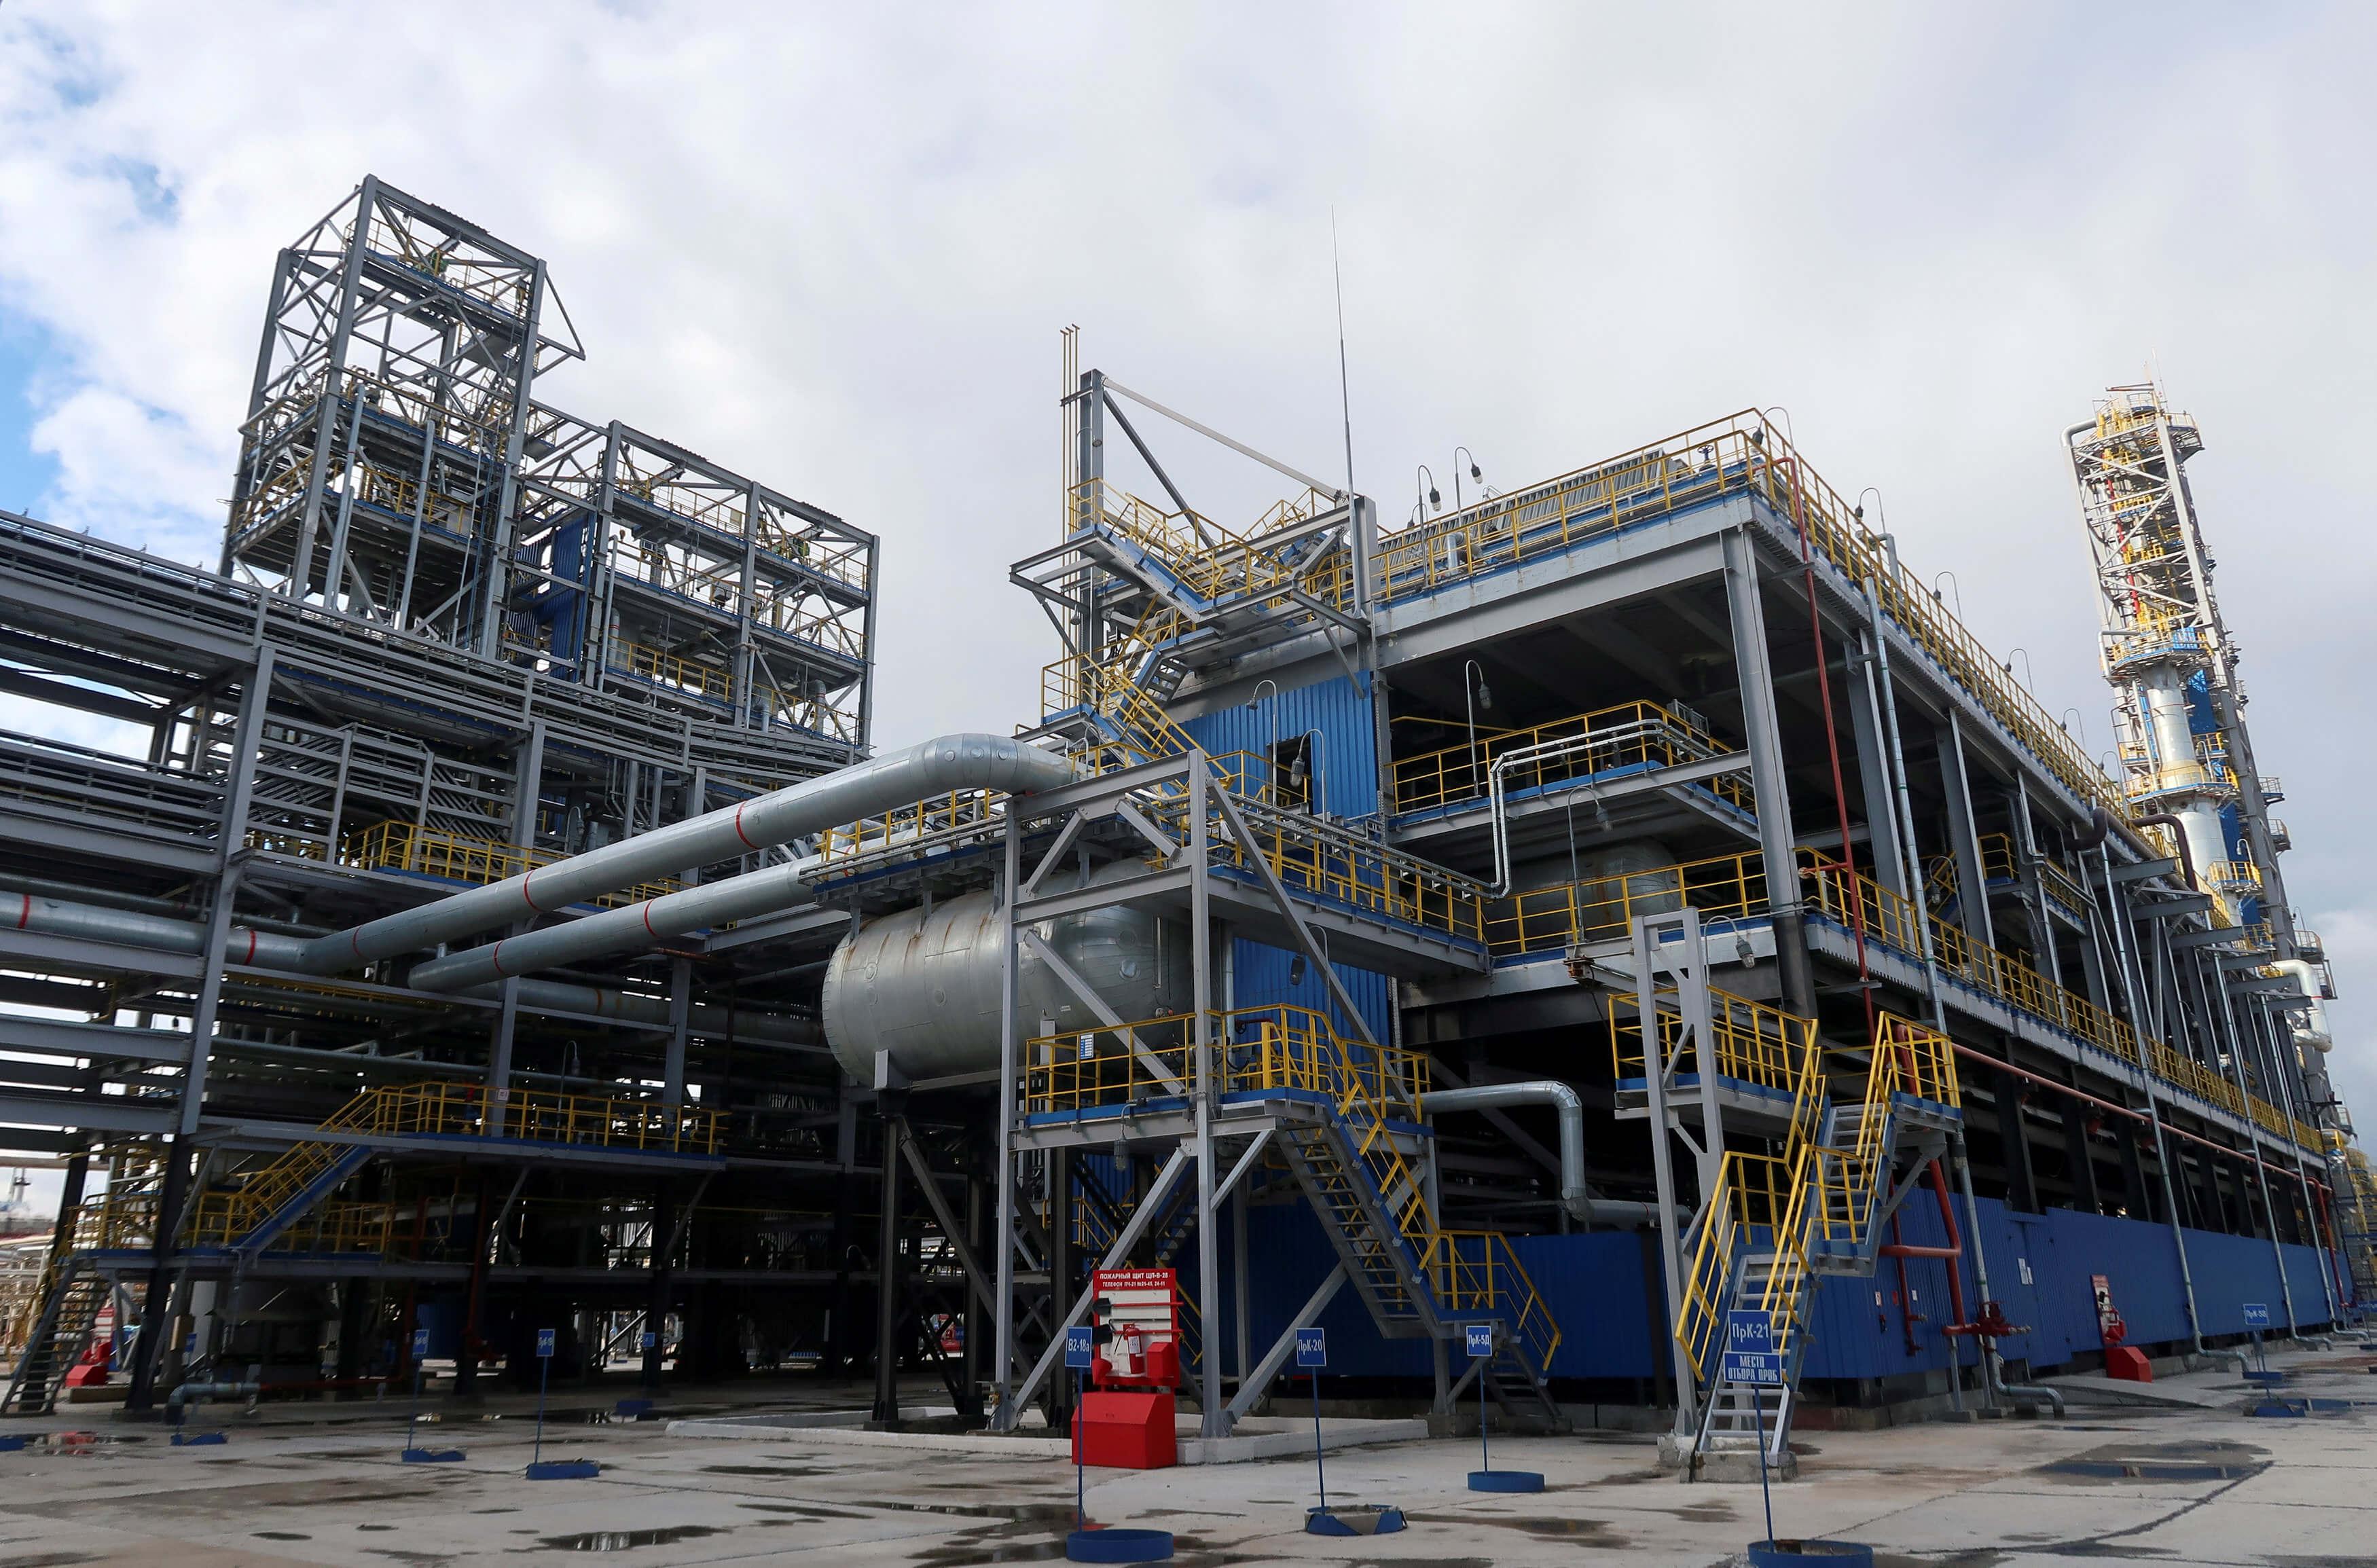 Gazprom: Θα ολοκληρώσει μόνη τον αγωγό Nord Stream 2 σε περίπτωση κυρώσεων